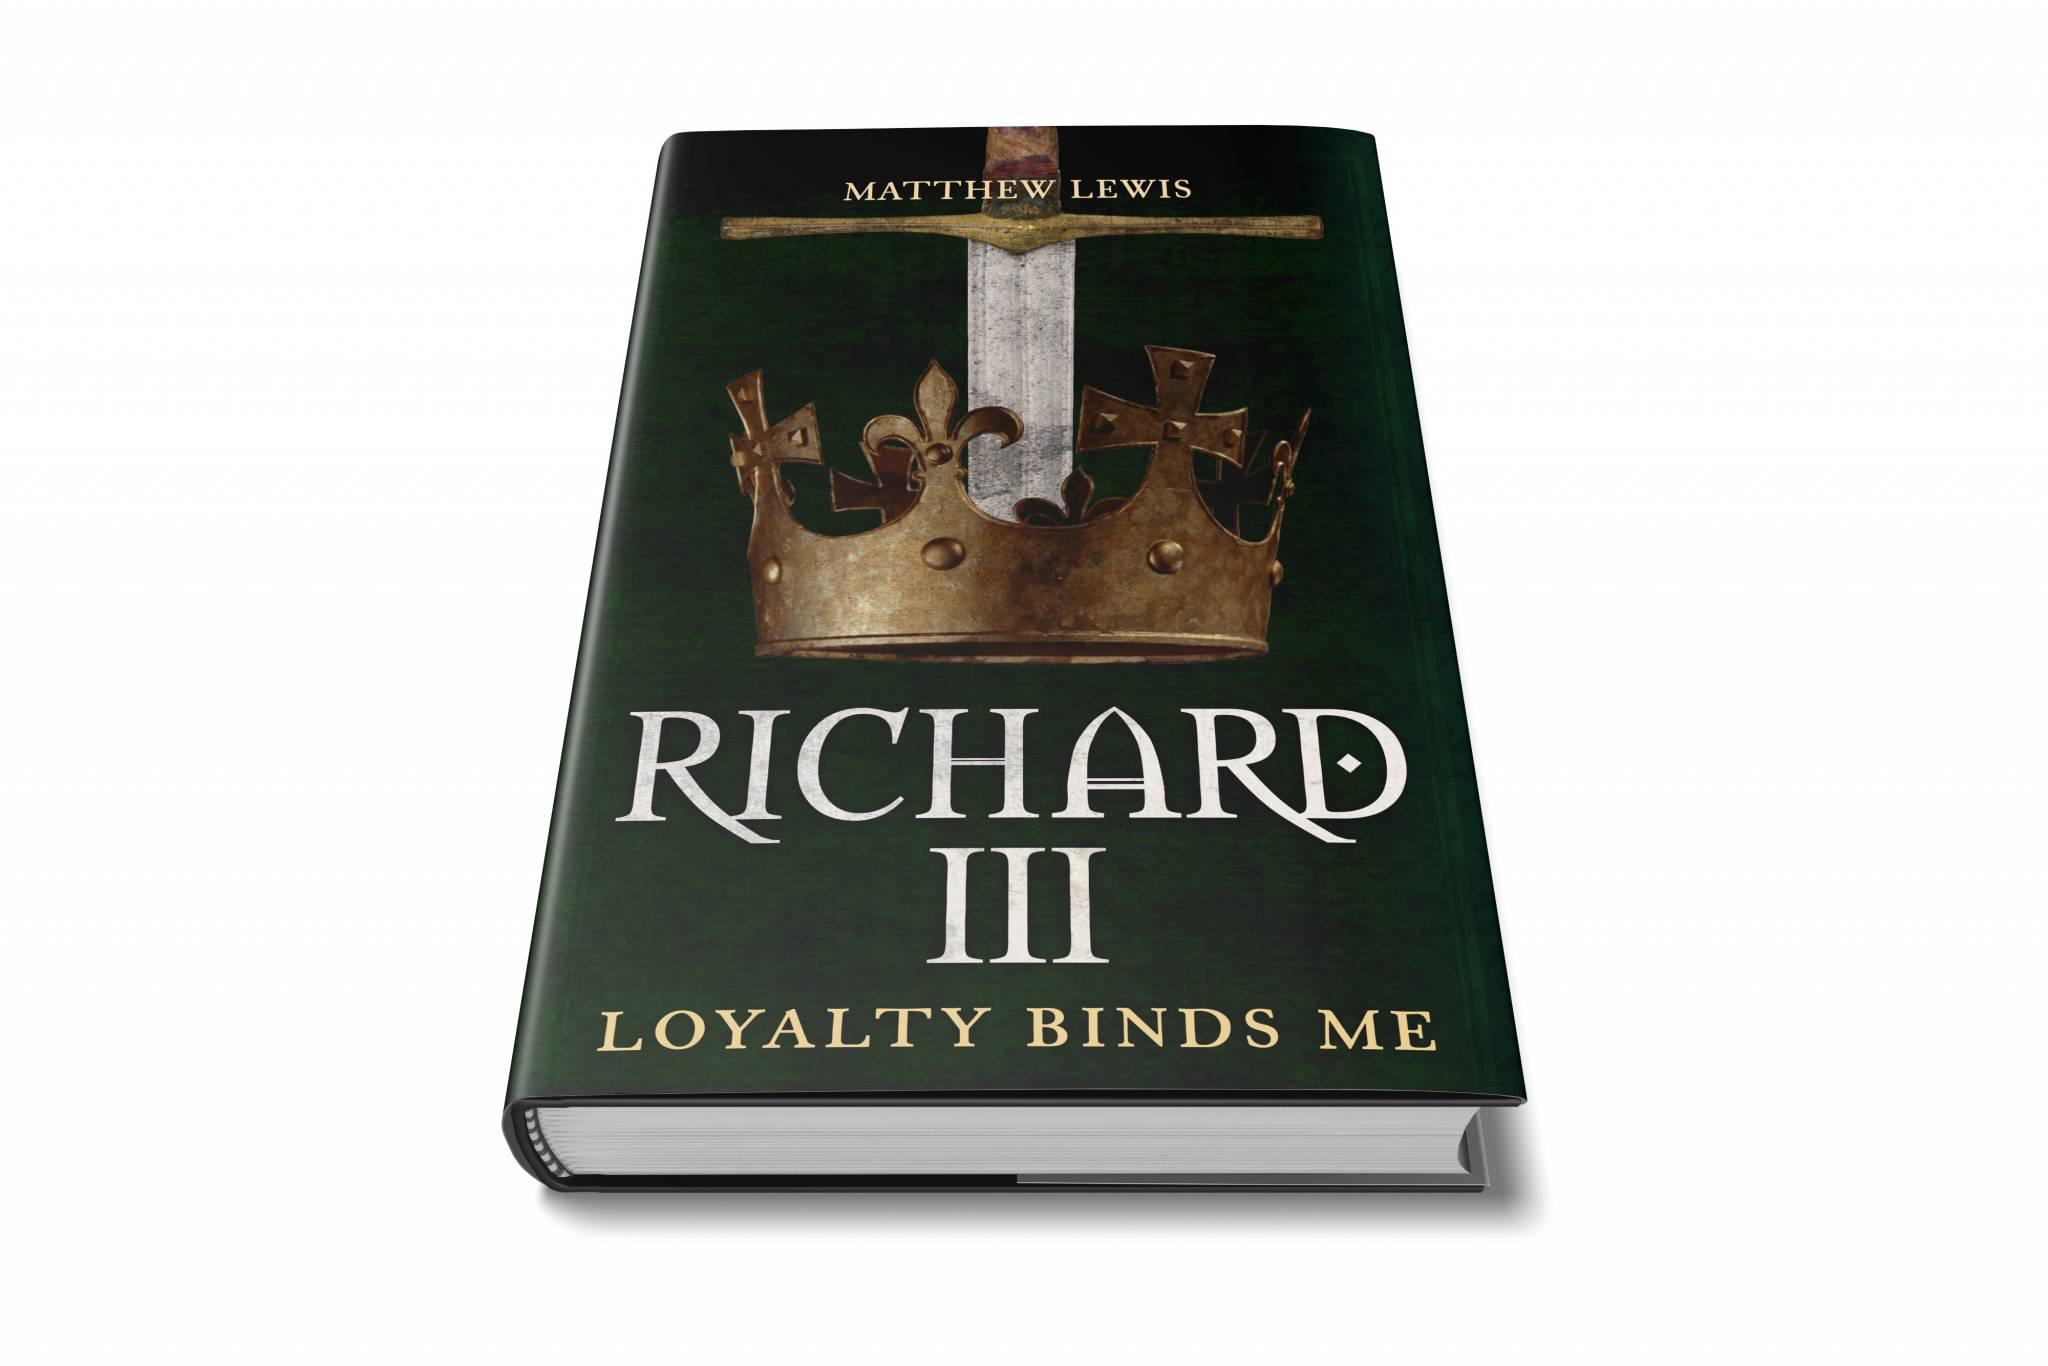 Matthew Lewis Talk - Richard III: Loyalty Binds Me